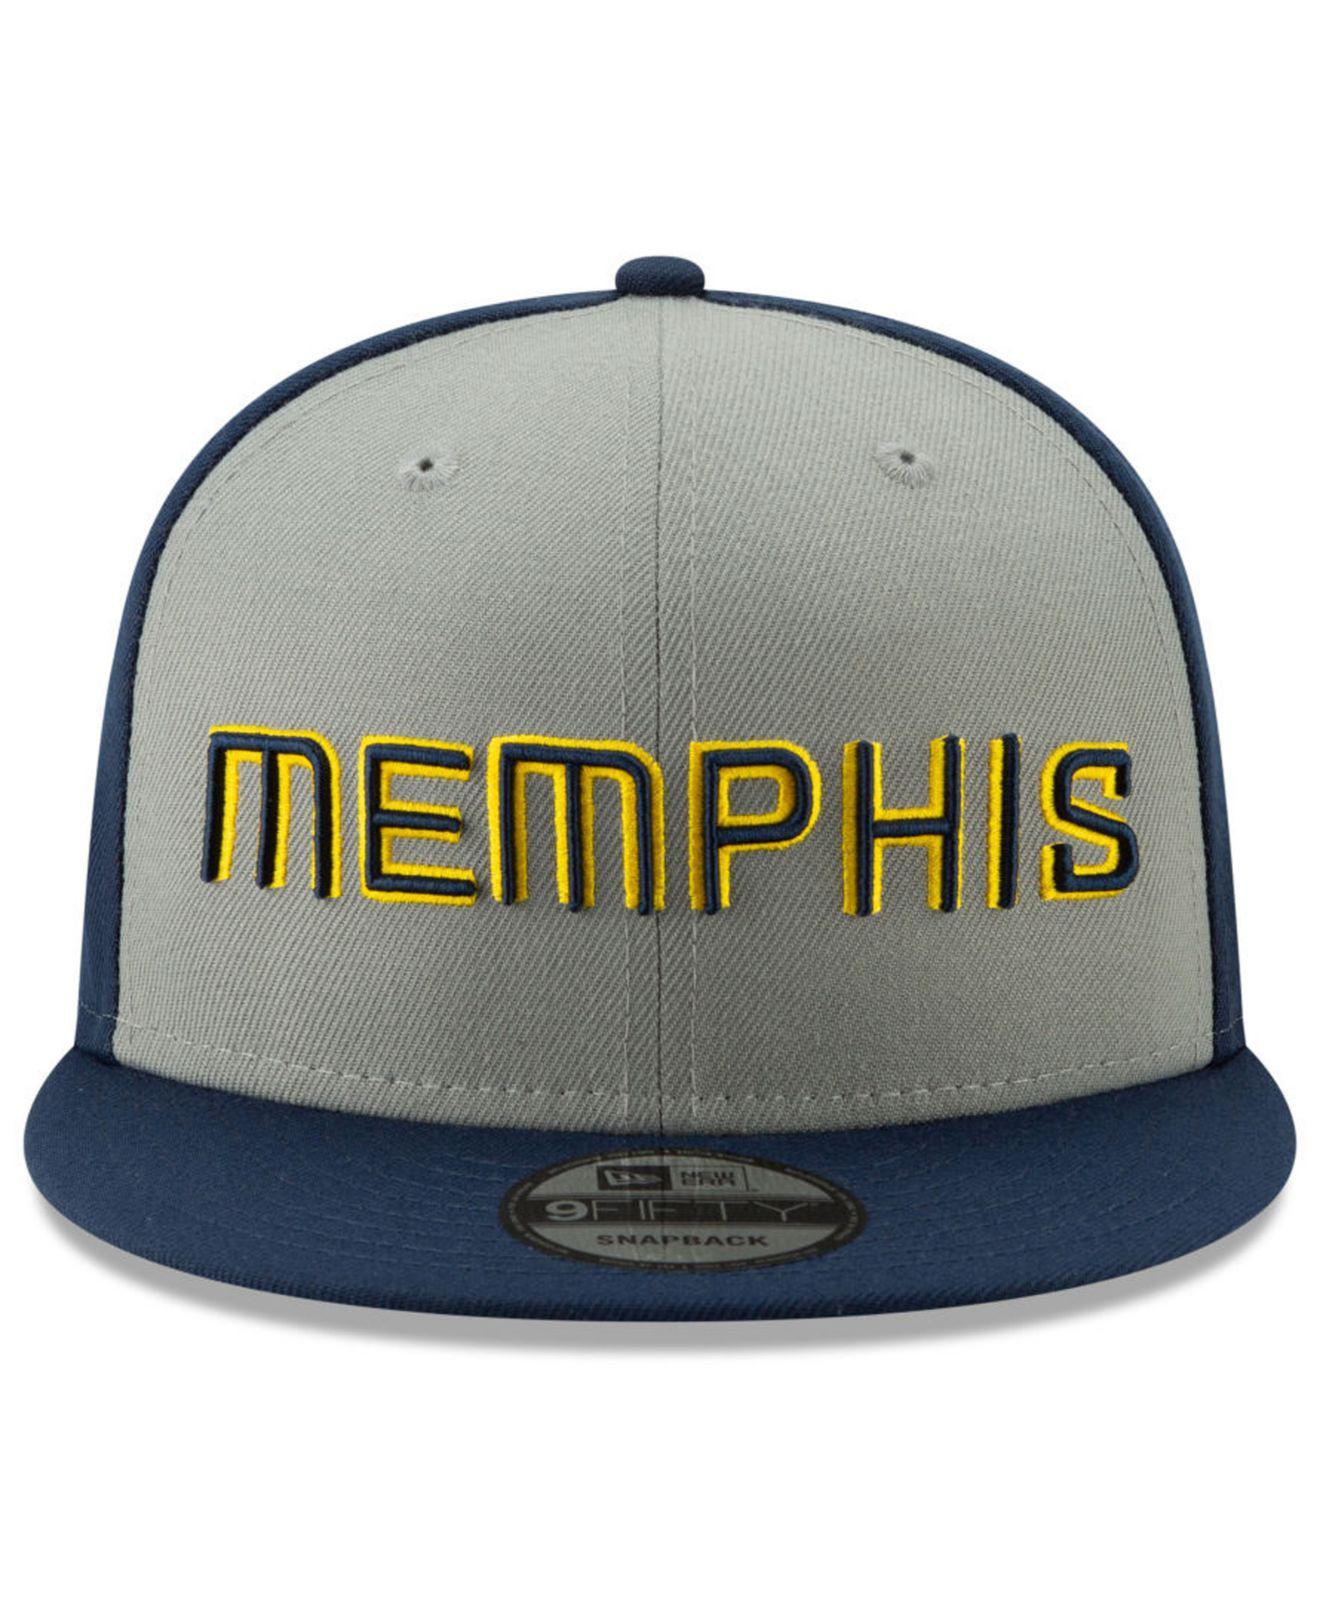 half off 060b7 4edcd Lyst - KTZ Memphis Grizzlies City Series 2.0 9fifty Snapback Cap in Blue  for Men